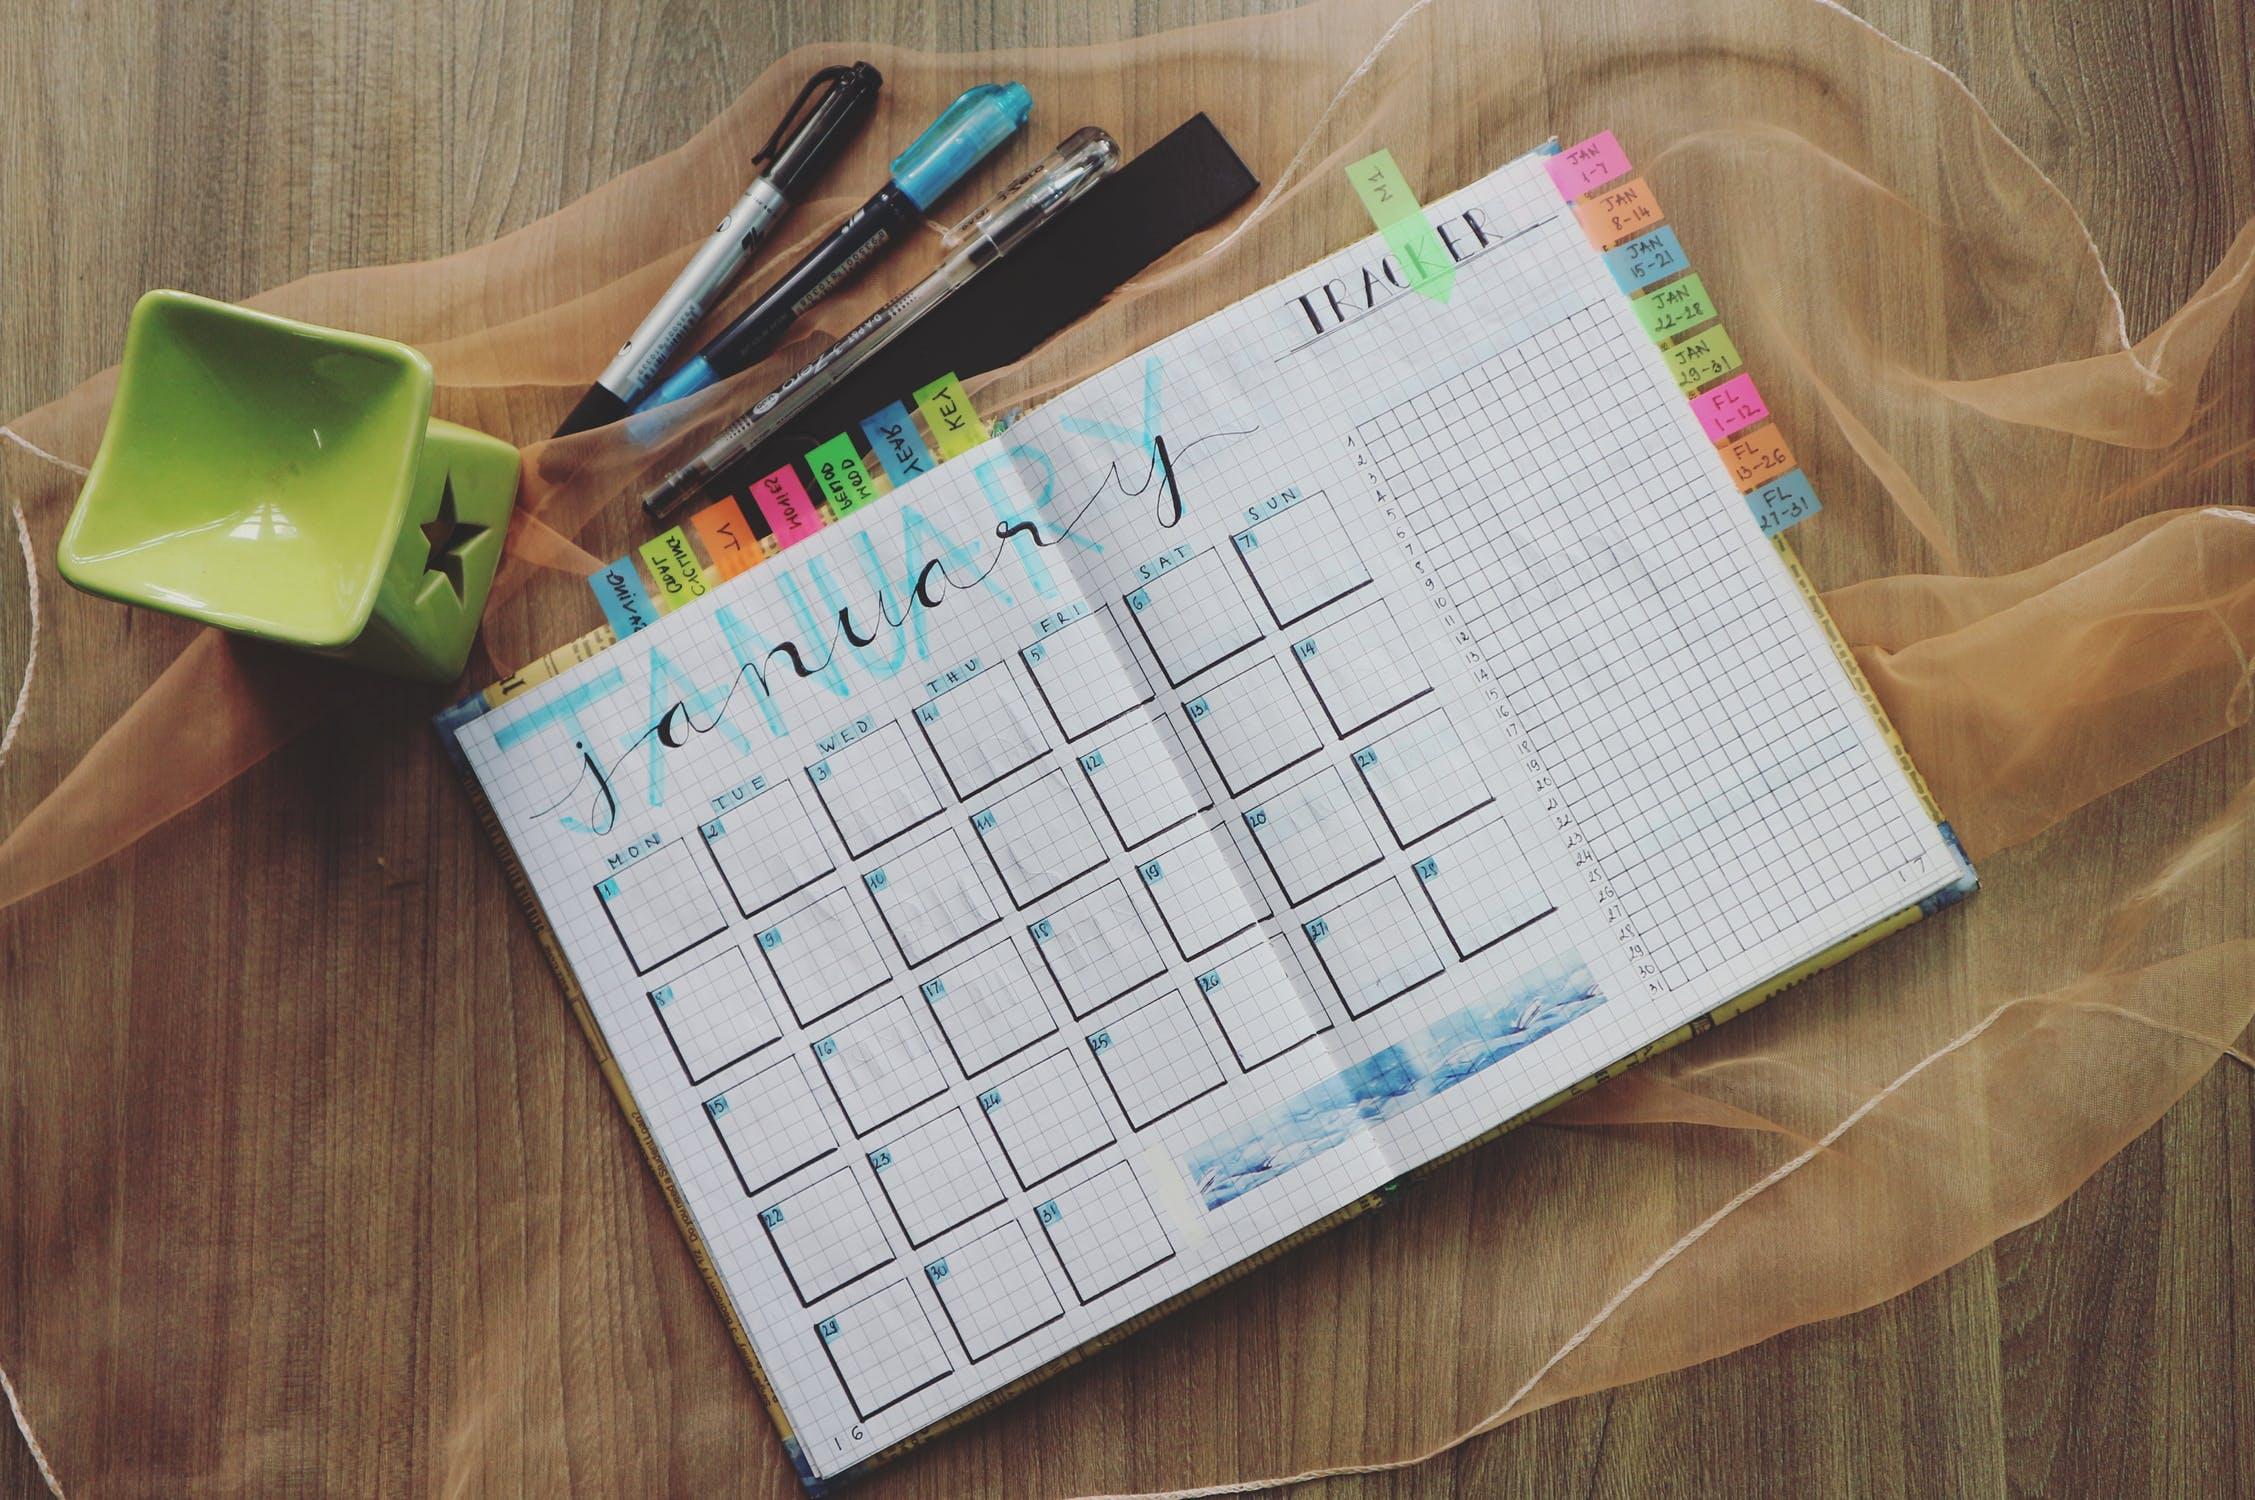 january calendar schedule rest